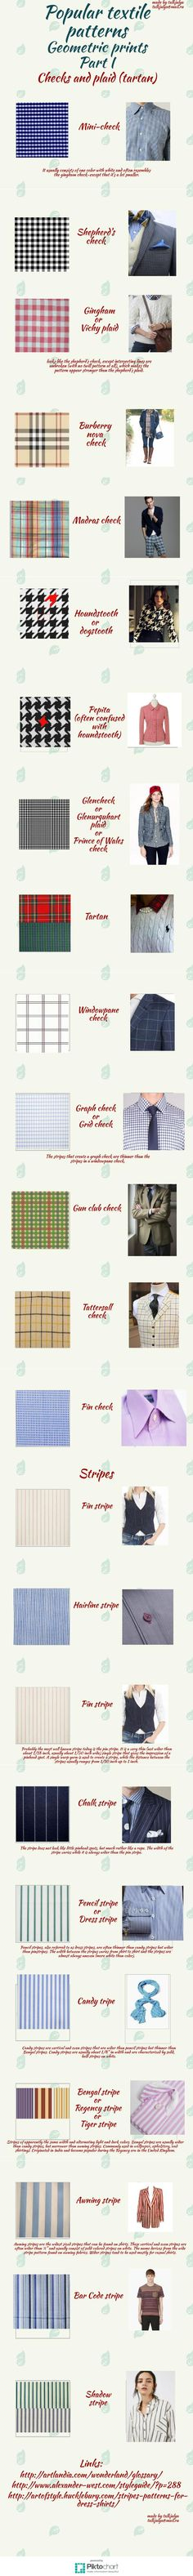 Popular patterns_Checks and stripes_ Part 1 | @Piktochart Infographic